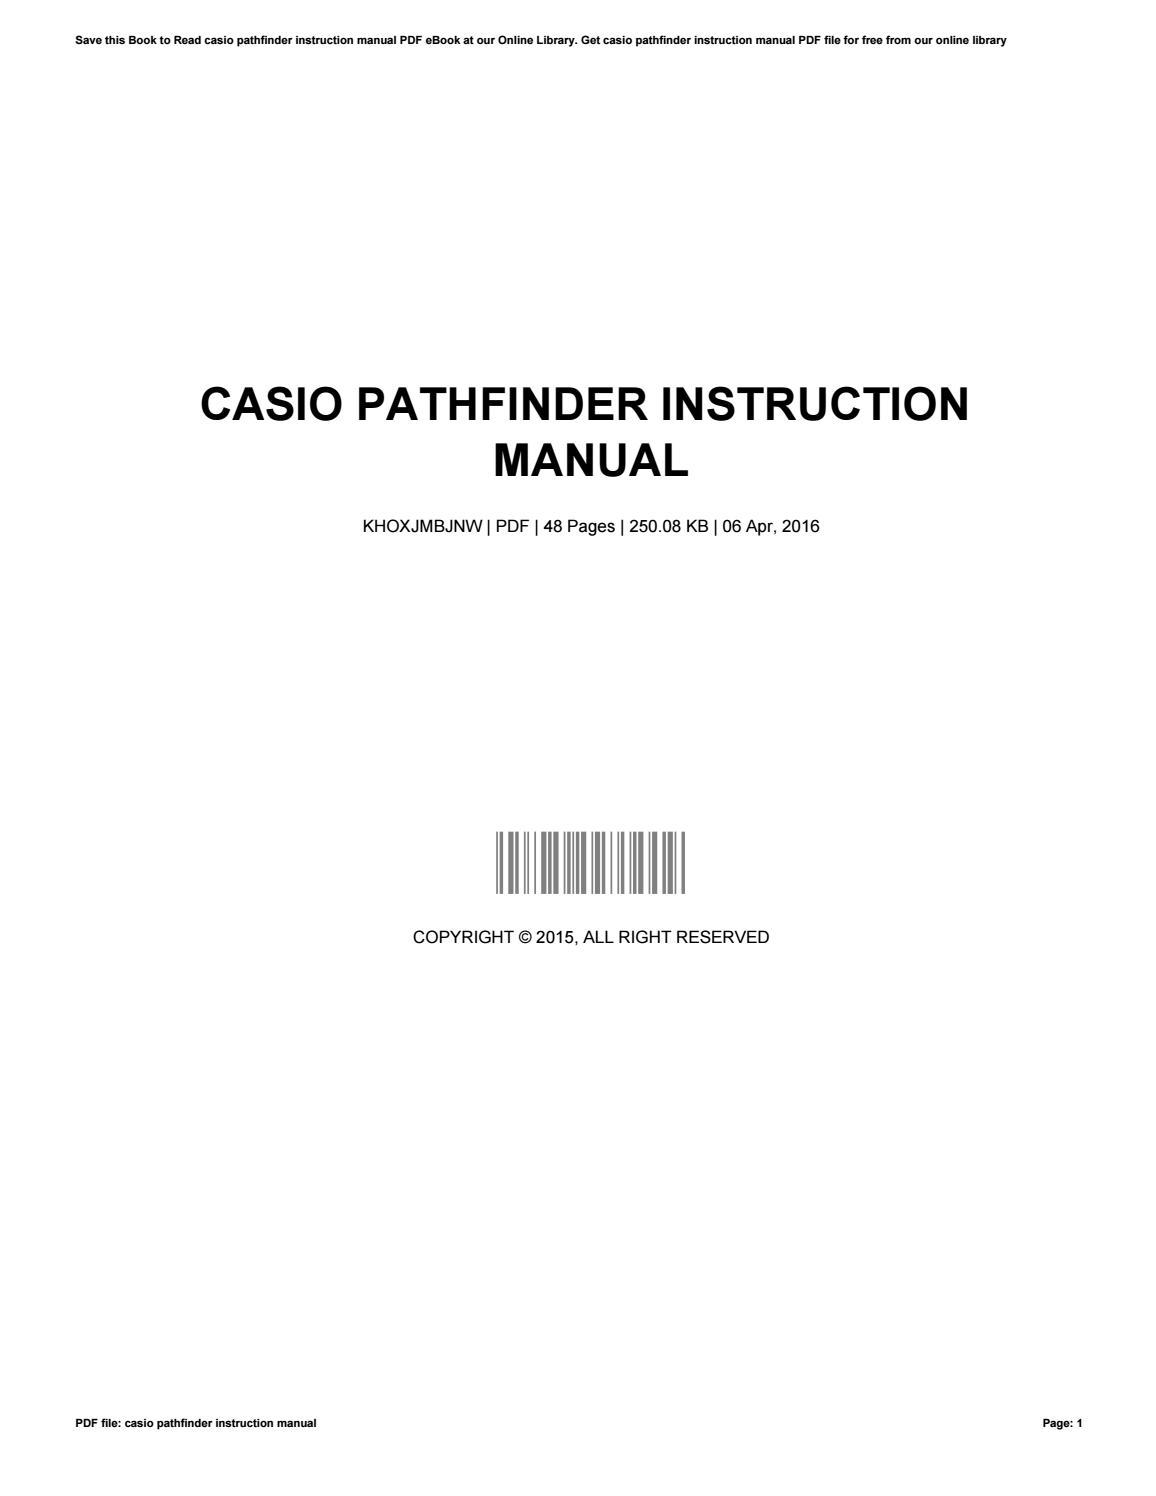 Casio Pathfinder Instruction Manual By Jameslawrence4663 Issuu